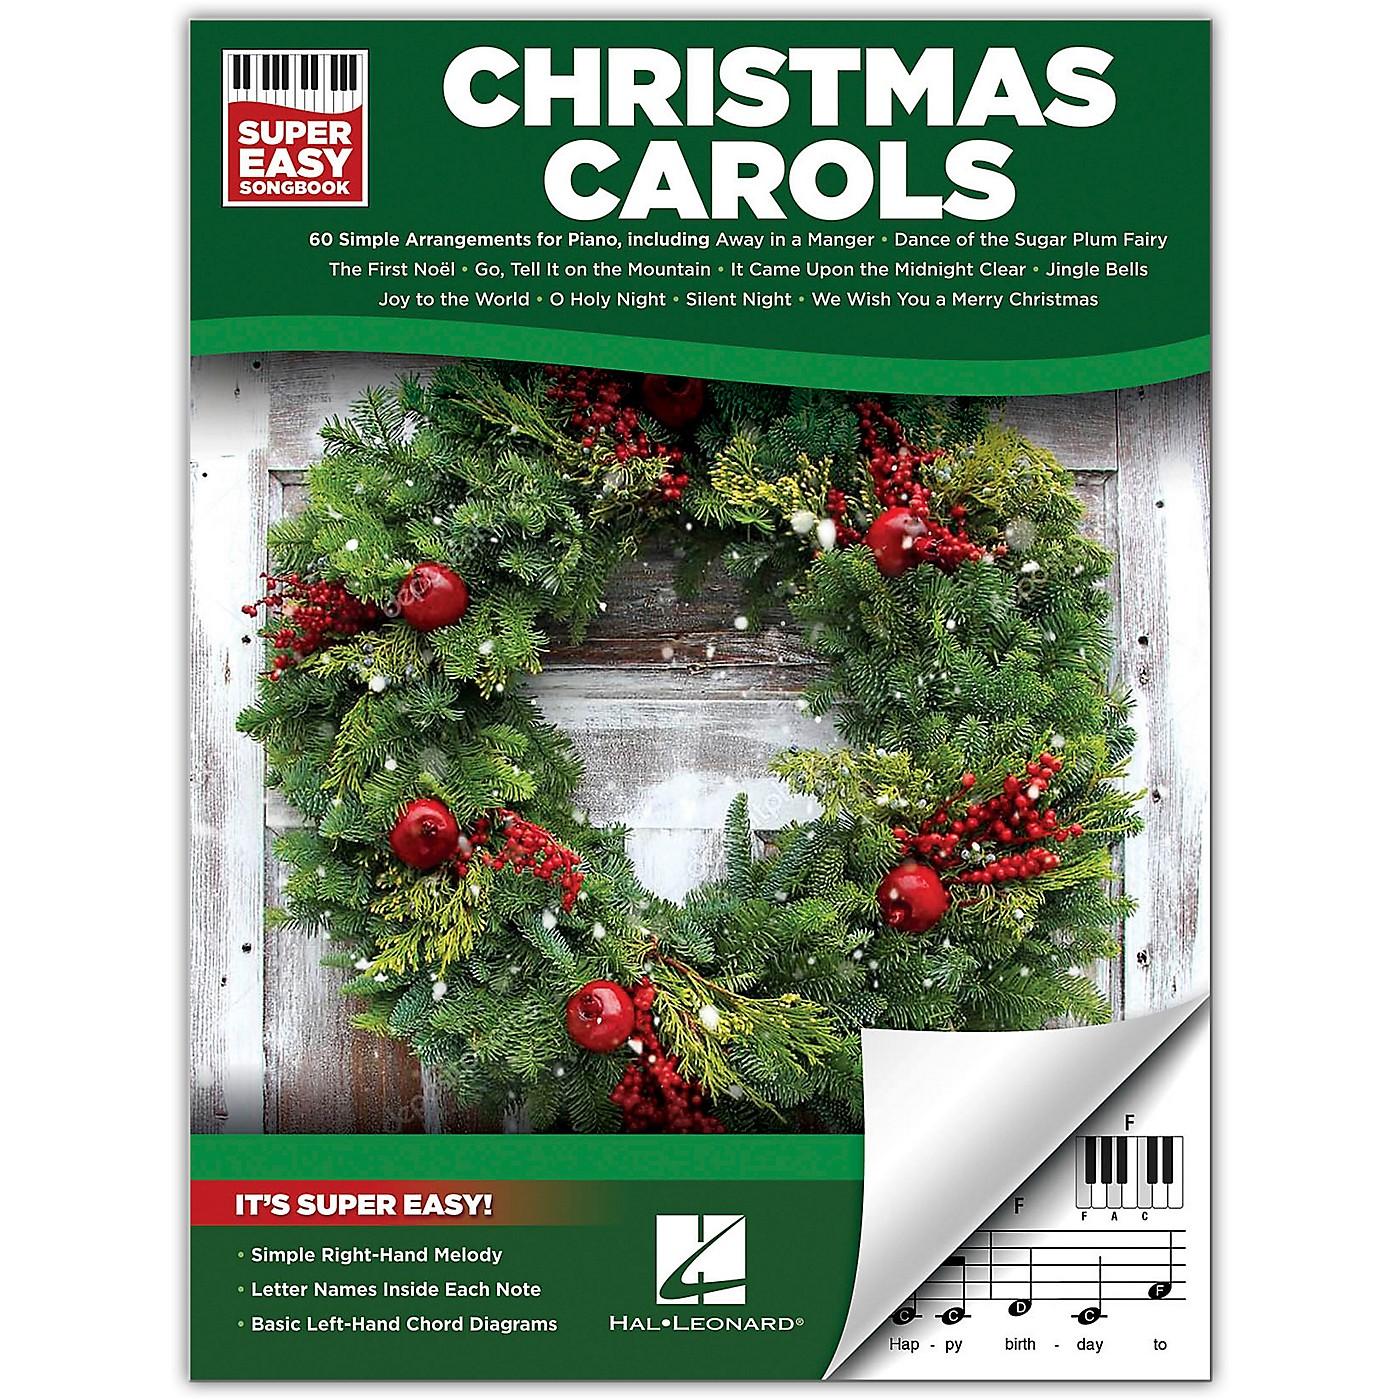 Hal Leonard Christmas Carols - Super Easy Songbook thumbnail